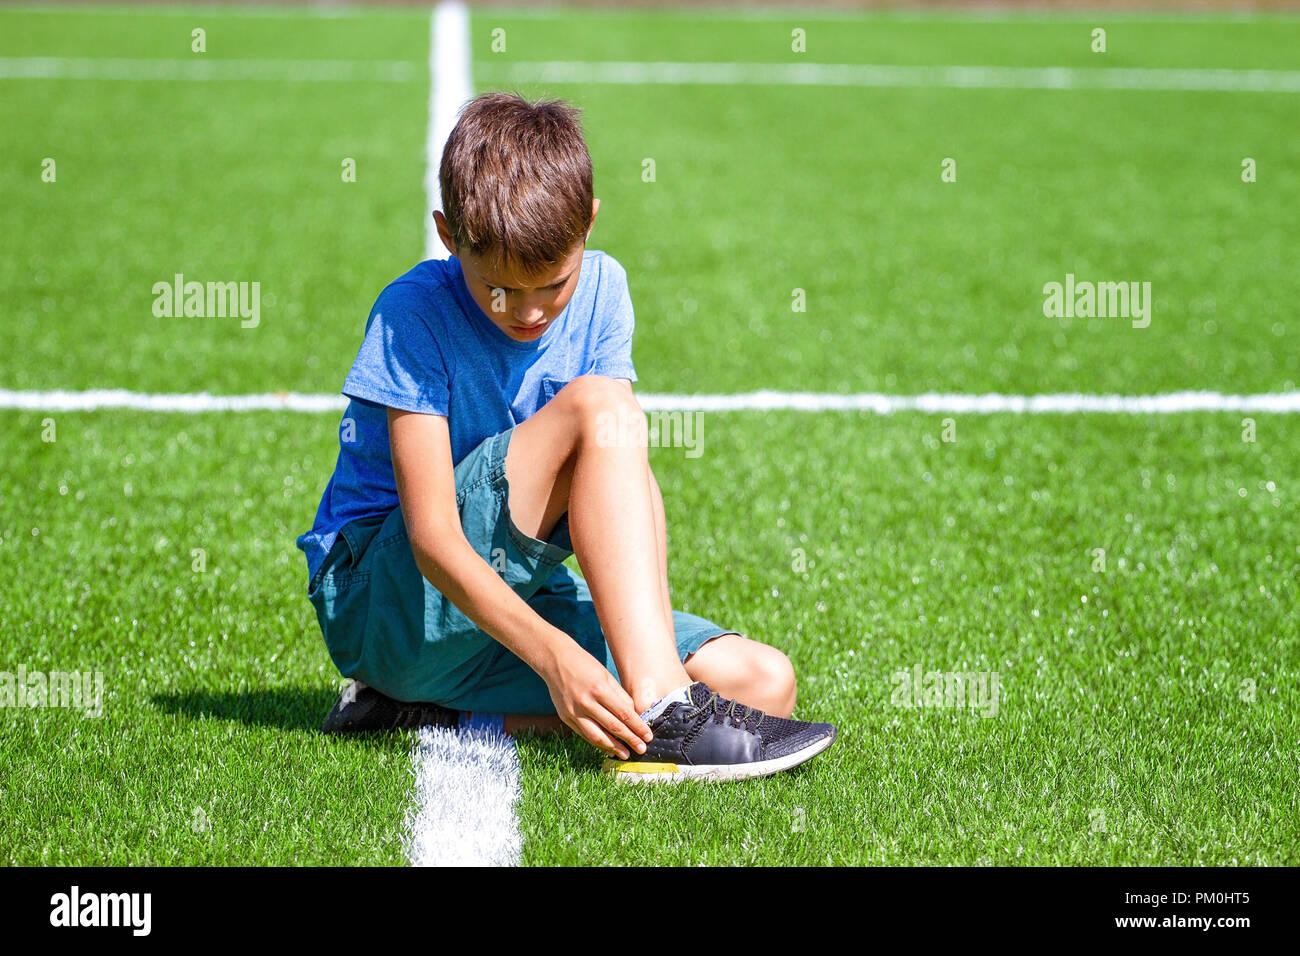 Boy injured his leg. Child sitting on the grass at soccer football stadium - Stock Image